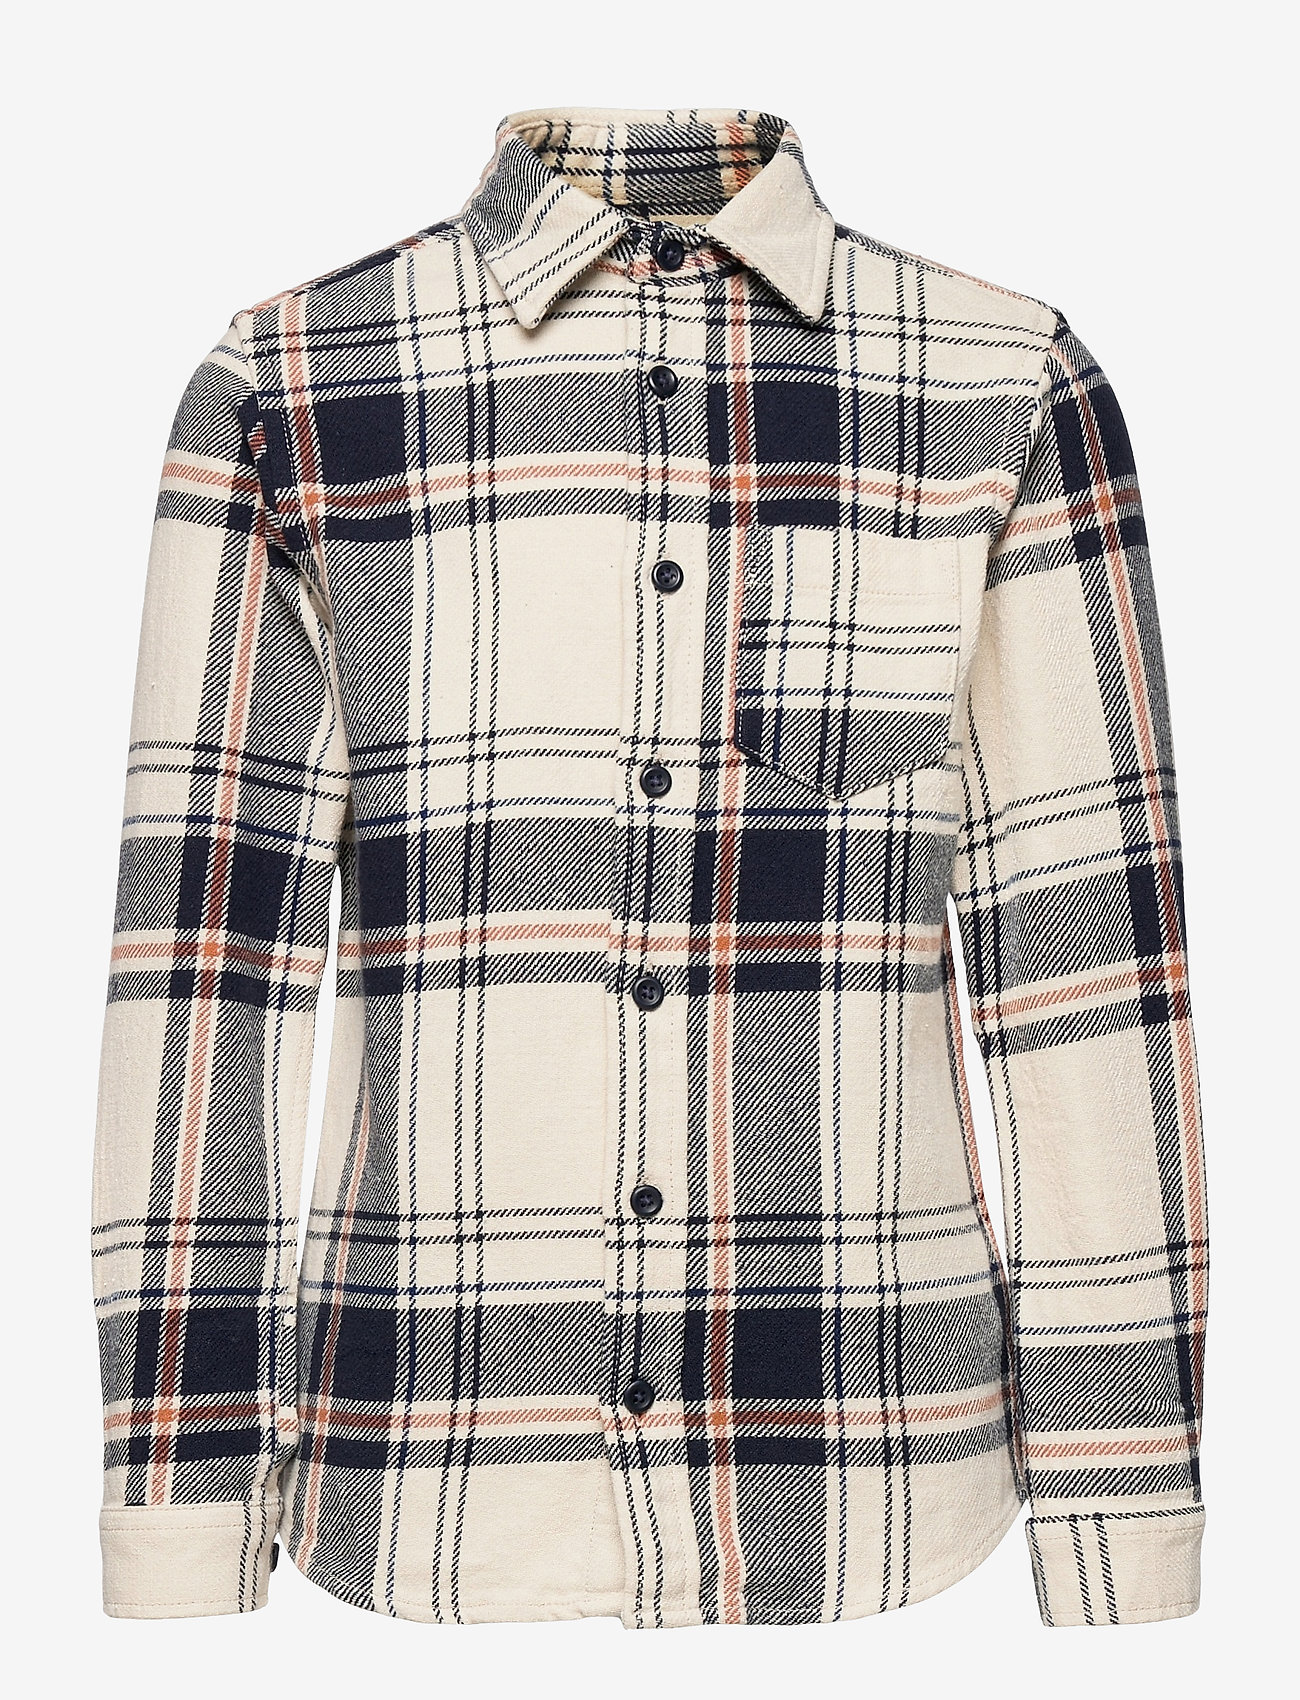 Jack & Jones - JORFINDER SHIRT LS JR - shirts - seedpearl - 0